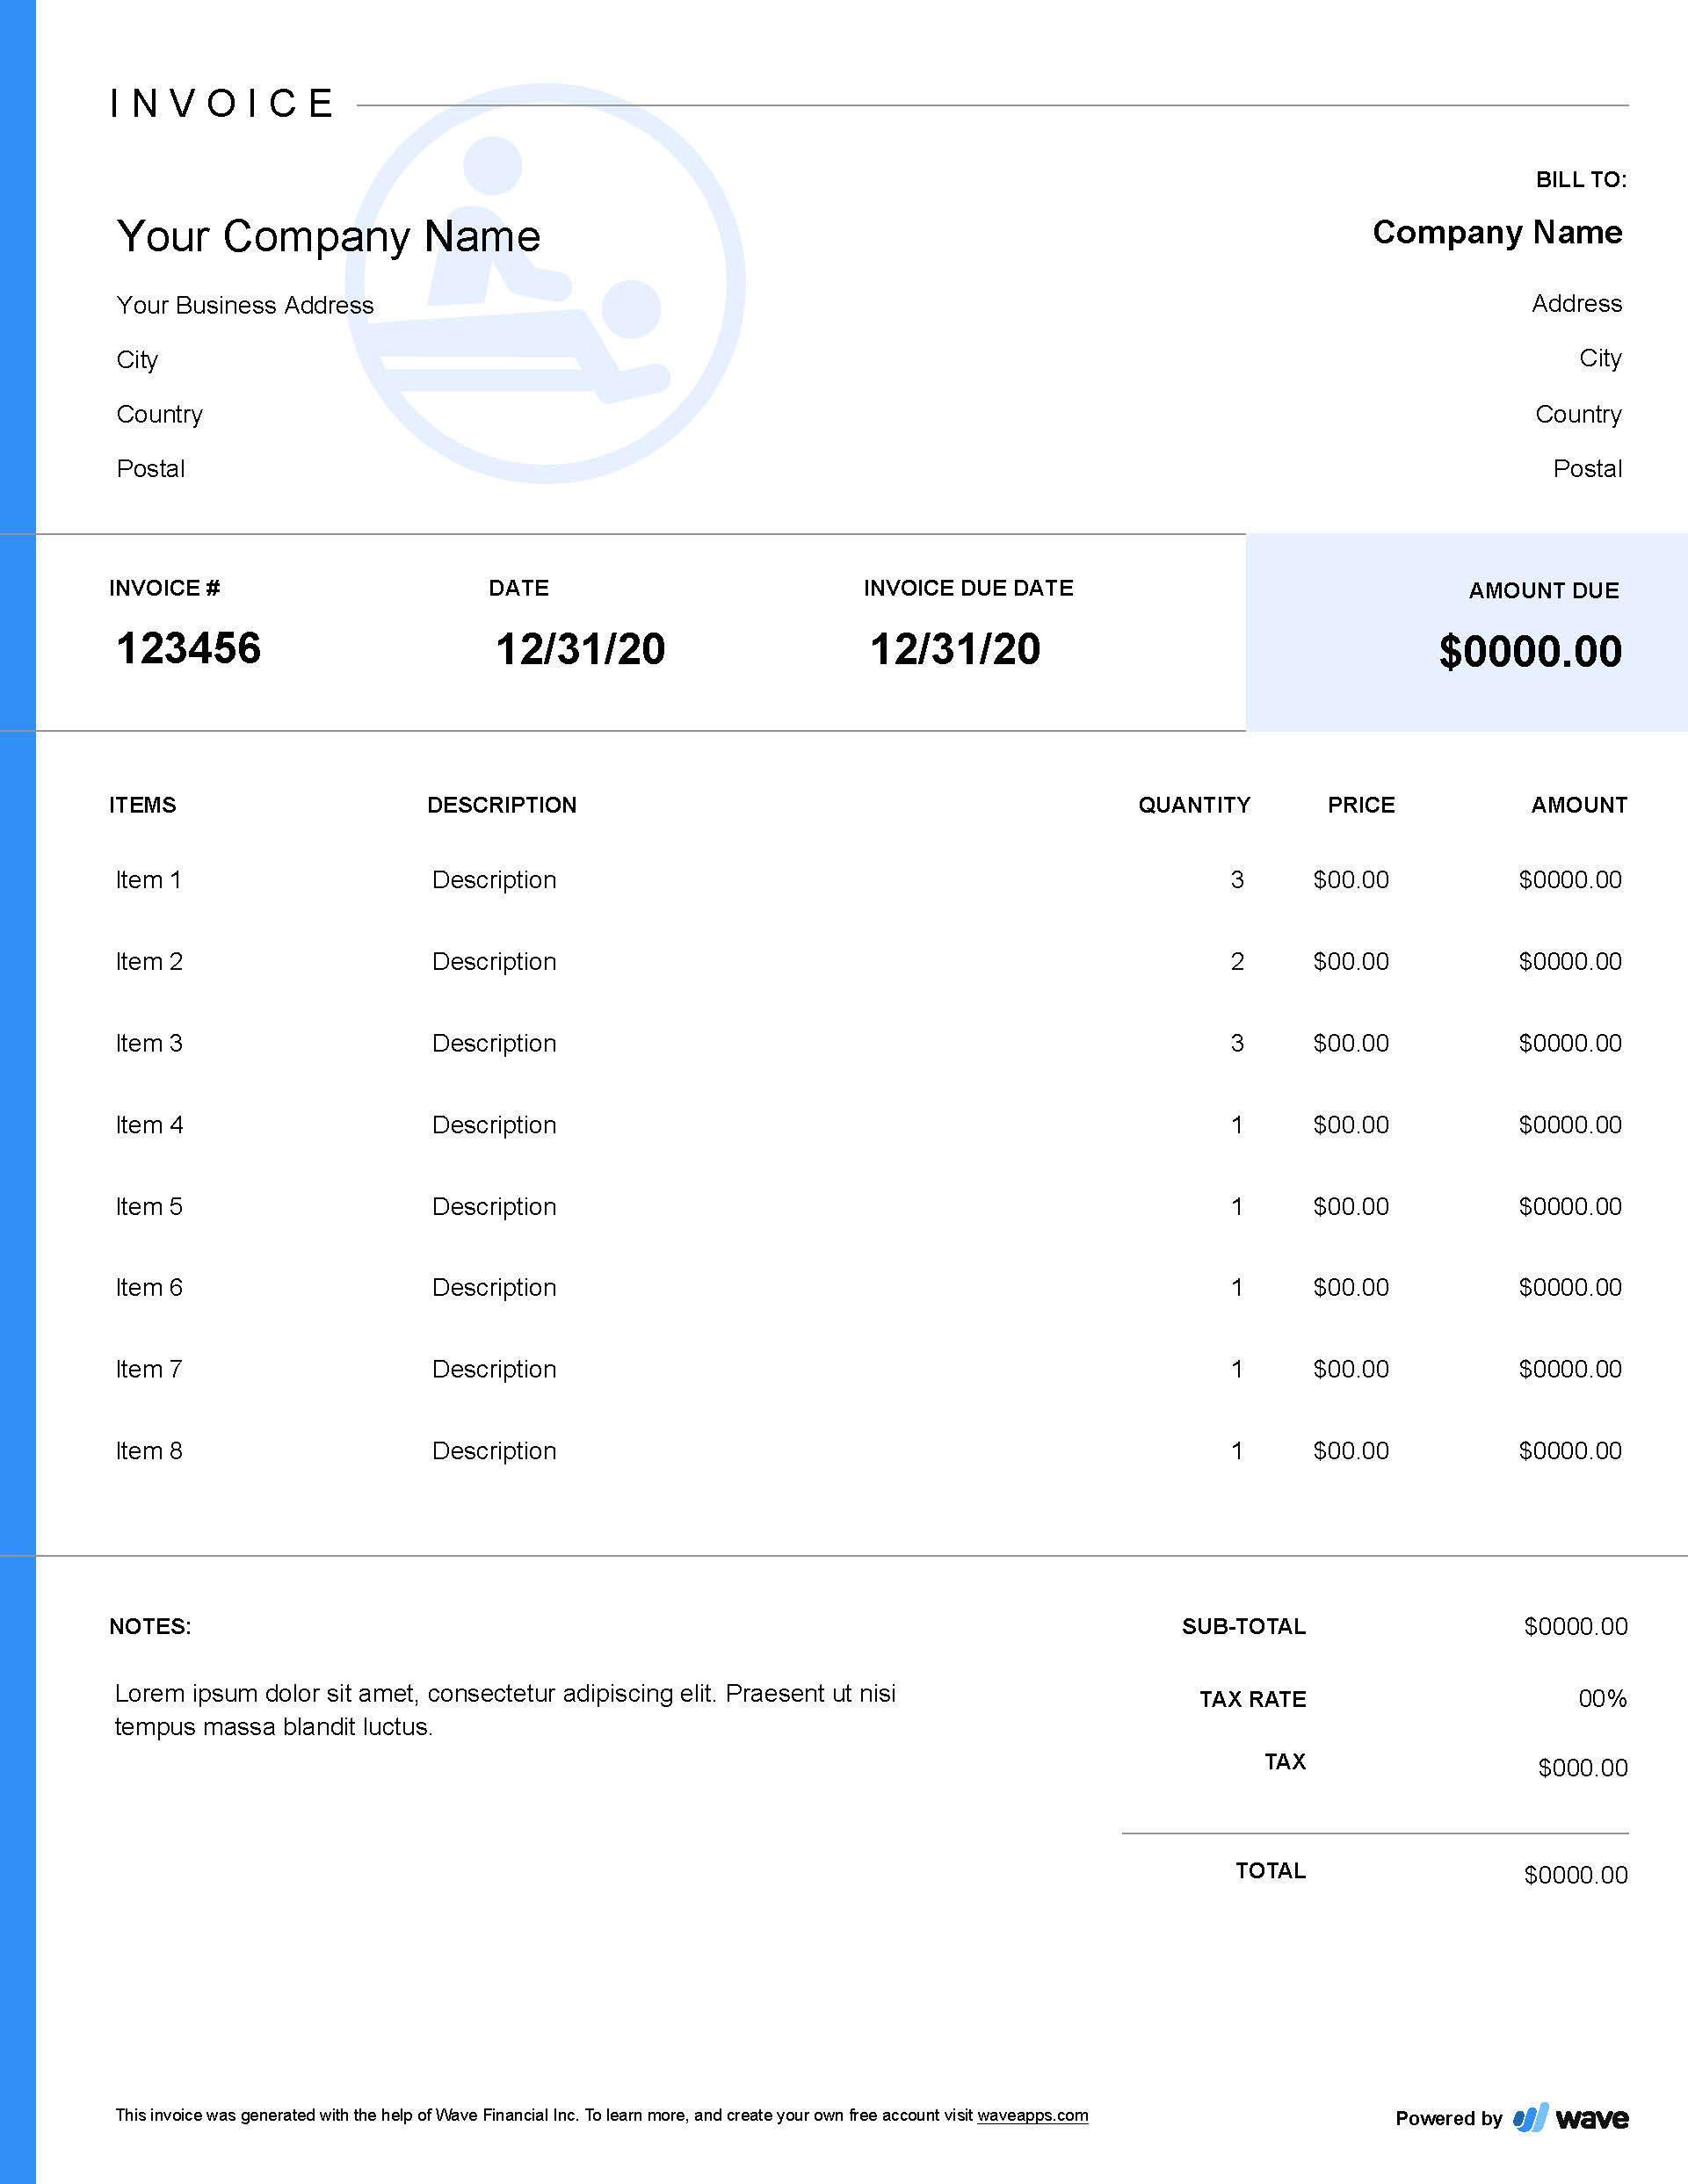 Receipt Invoice Template from dwdqz3611m4qq.cloudfront.net